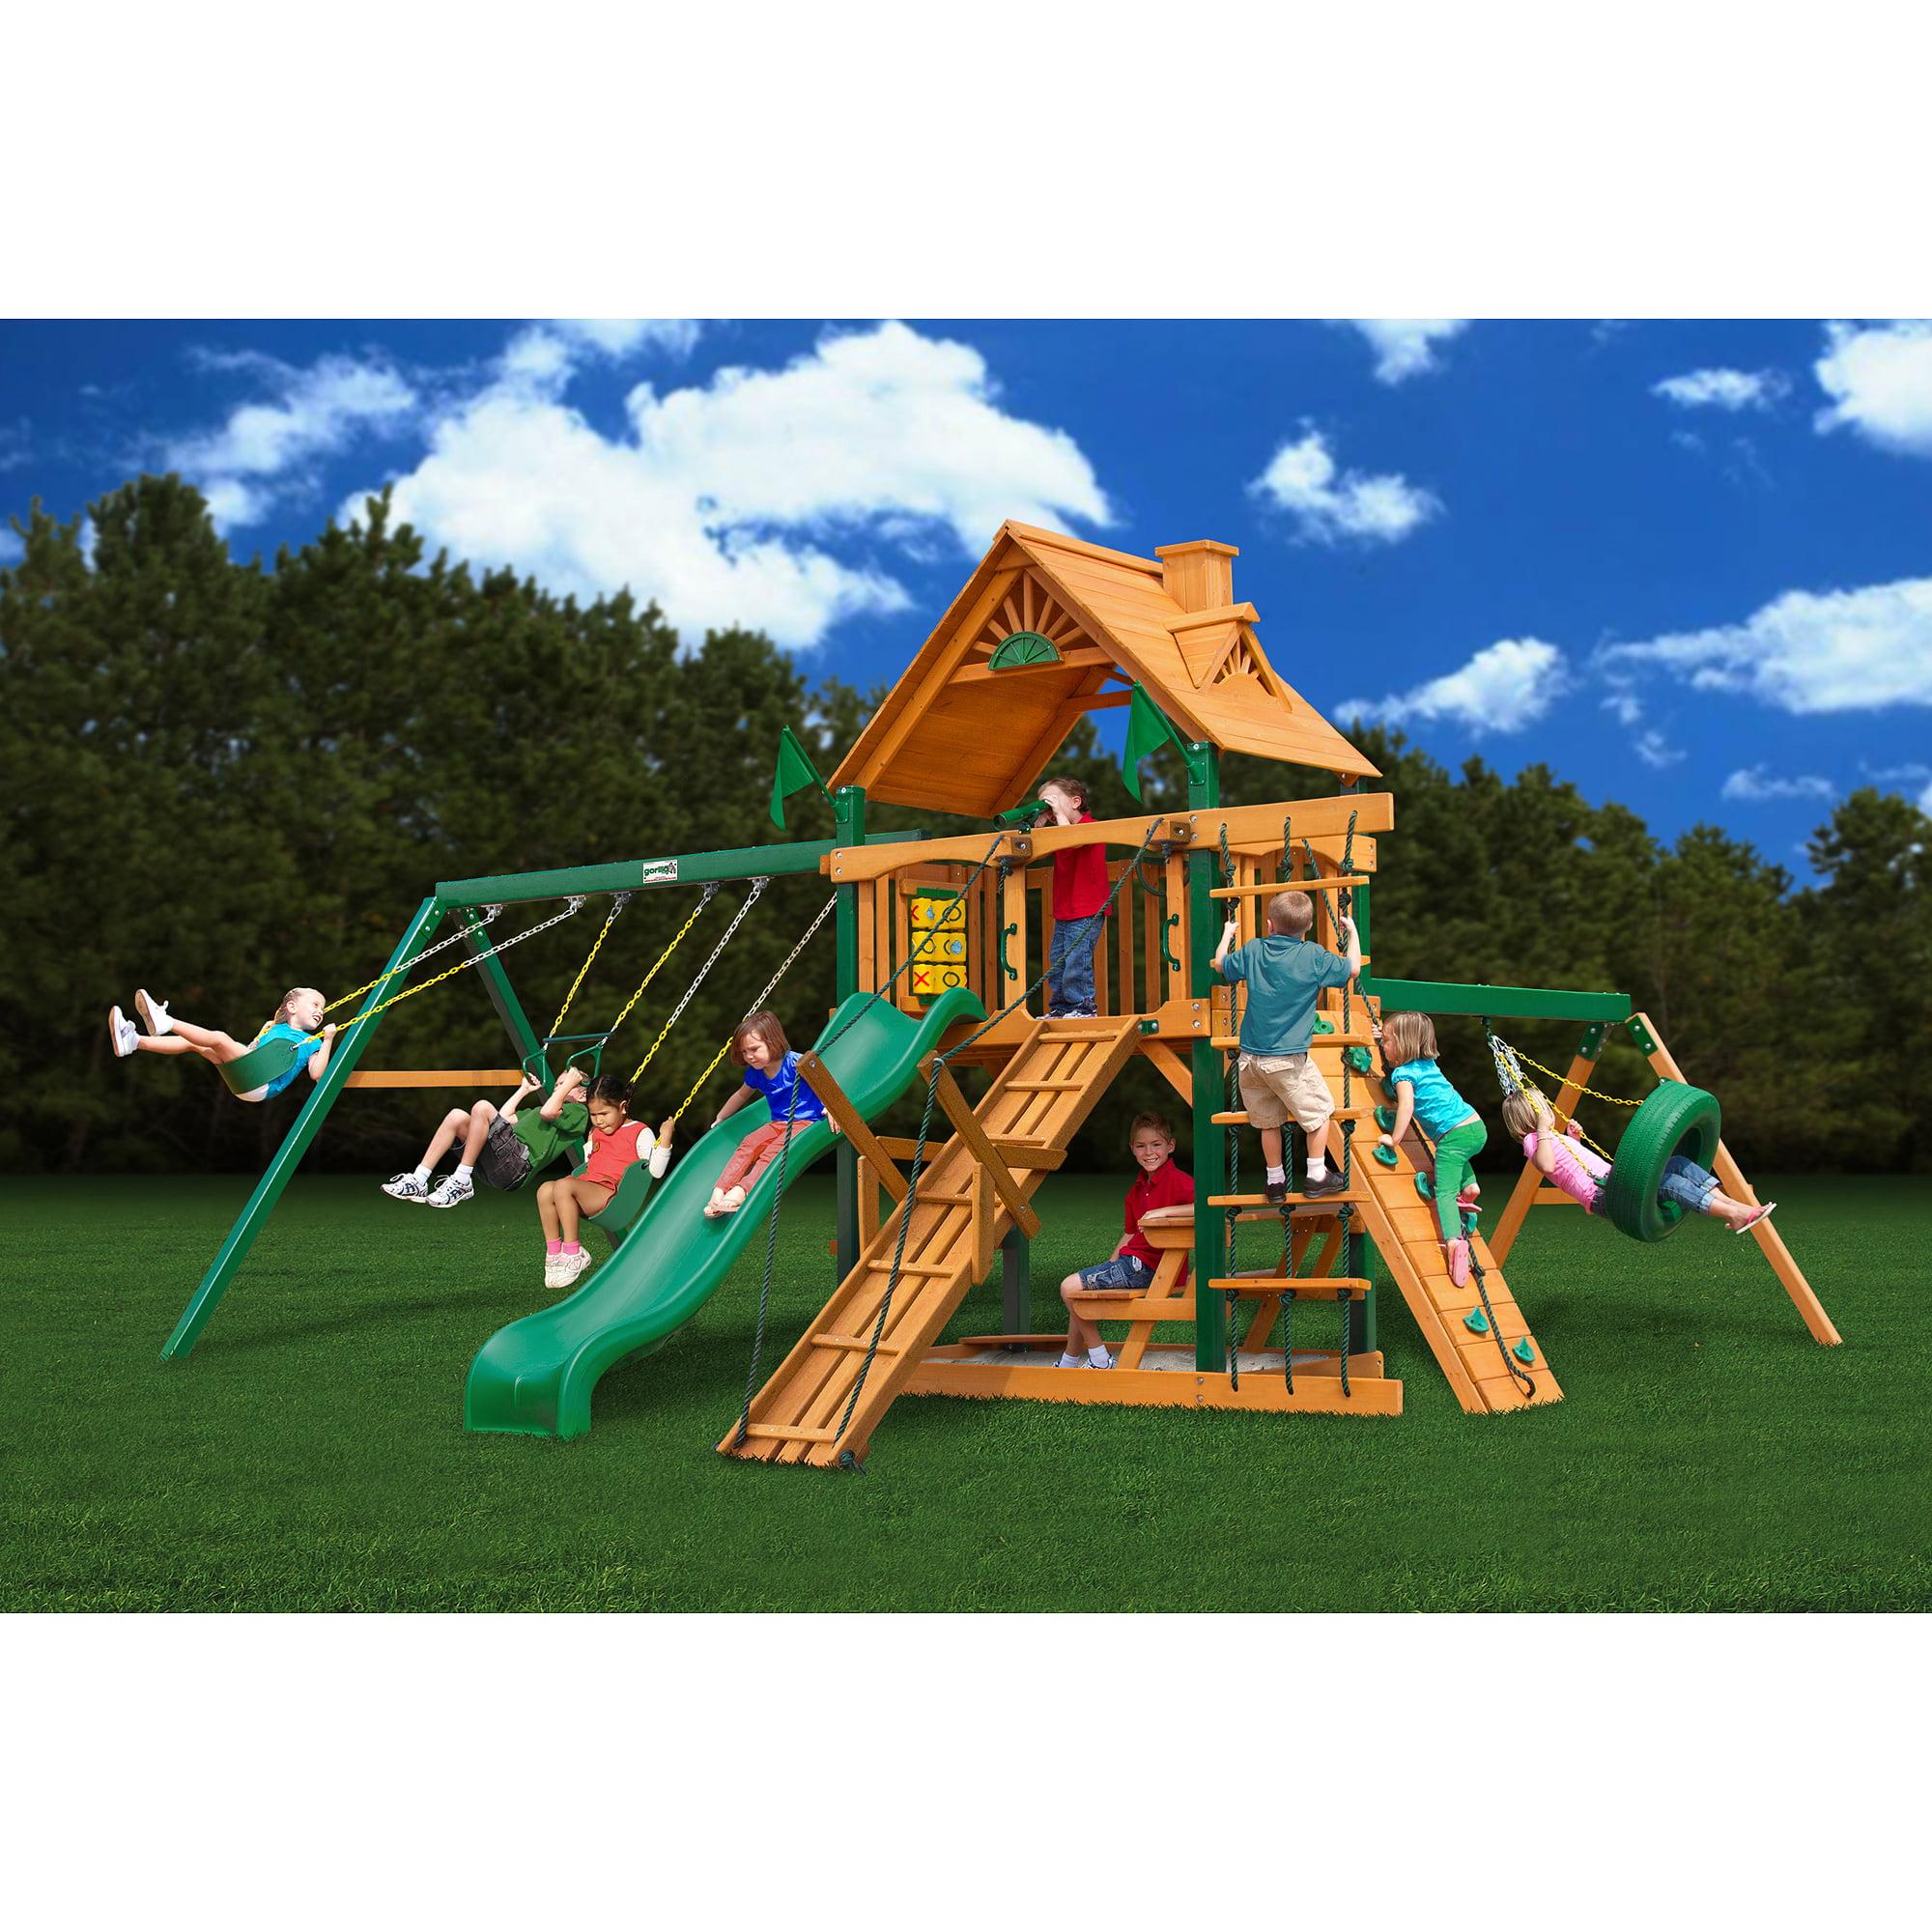 Gorilla Playsets Frontier Cedar Wooden Swing Set